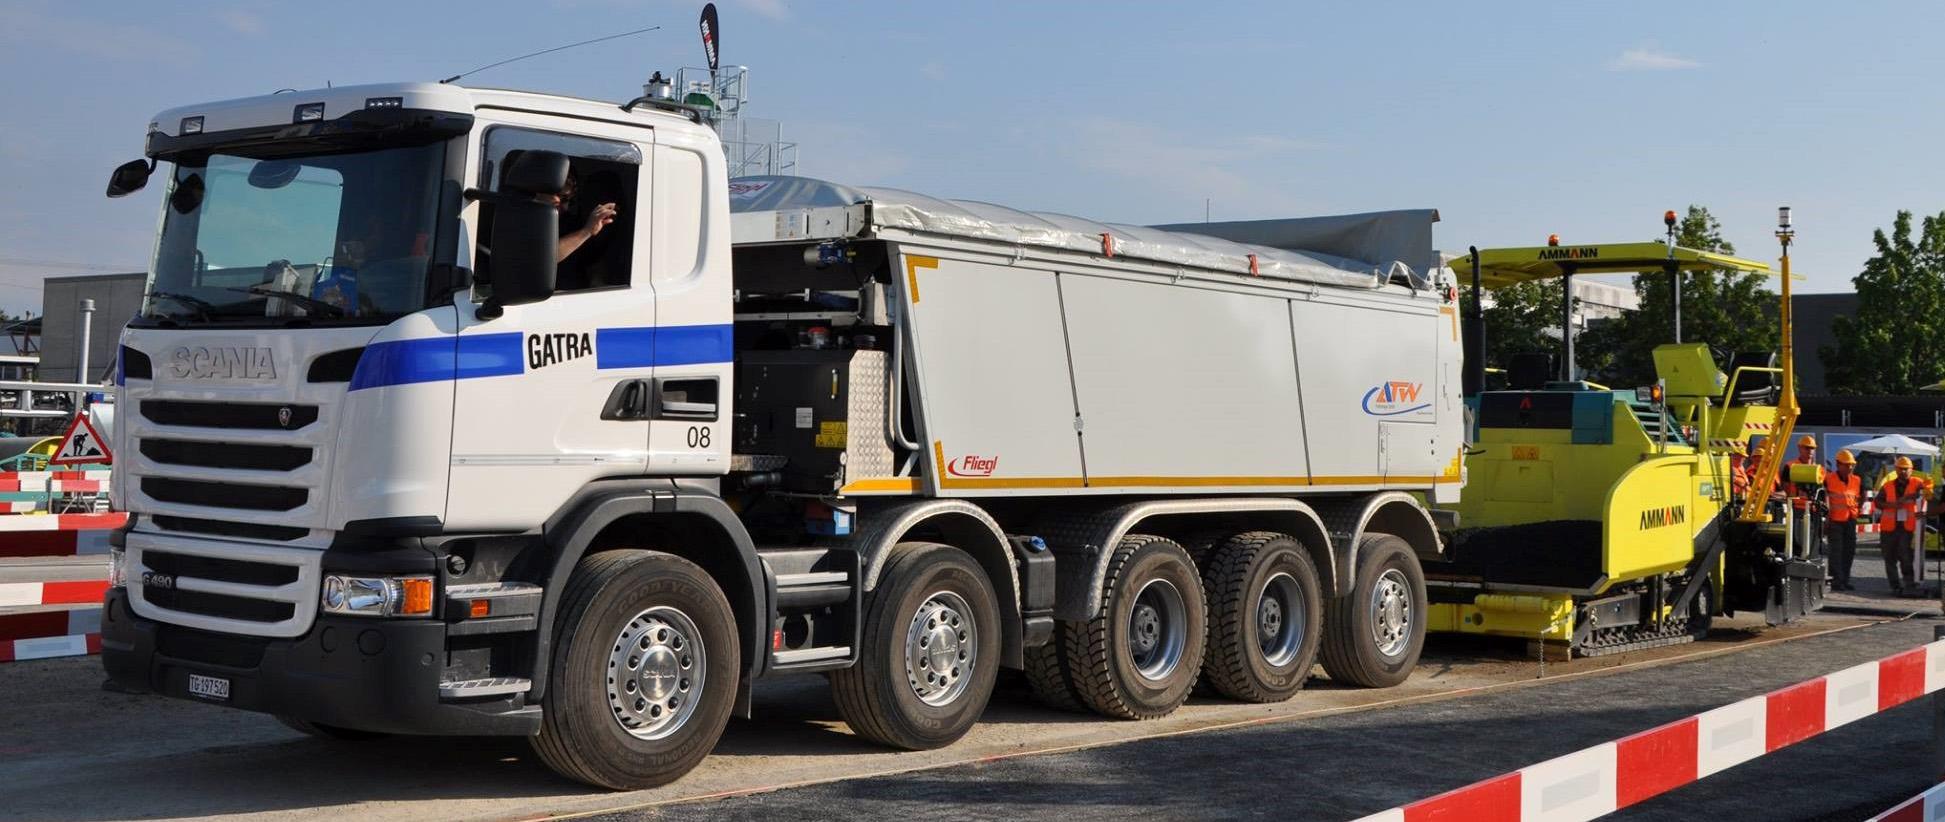 ASW Stone LKW 5729 Scania